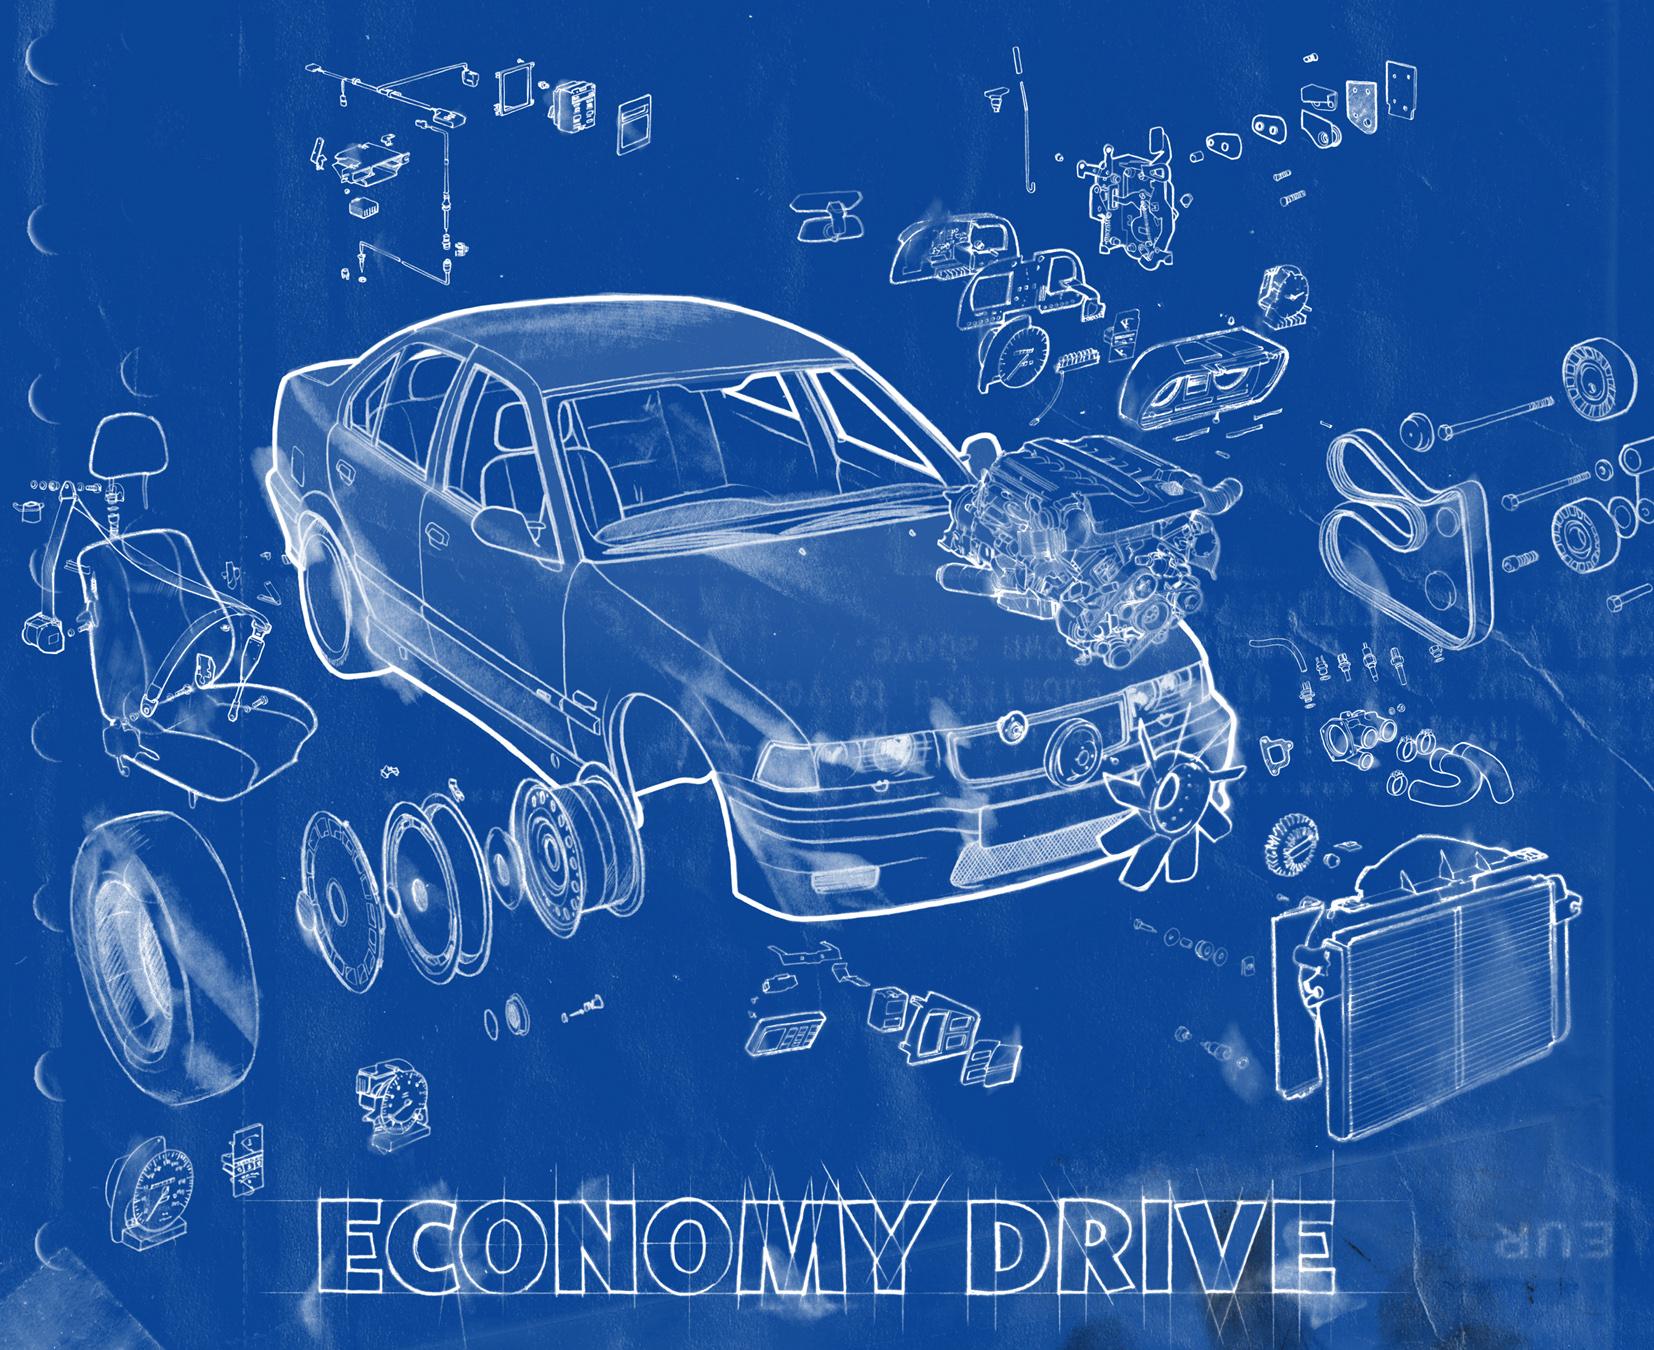 Economy Drive / Supply Management Magazine